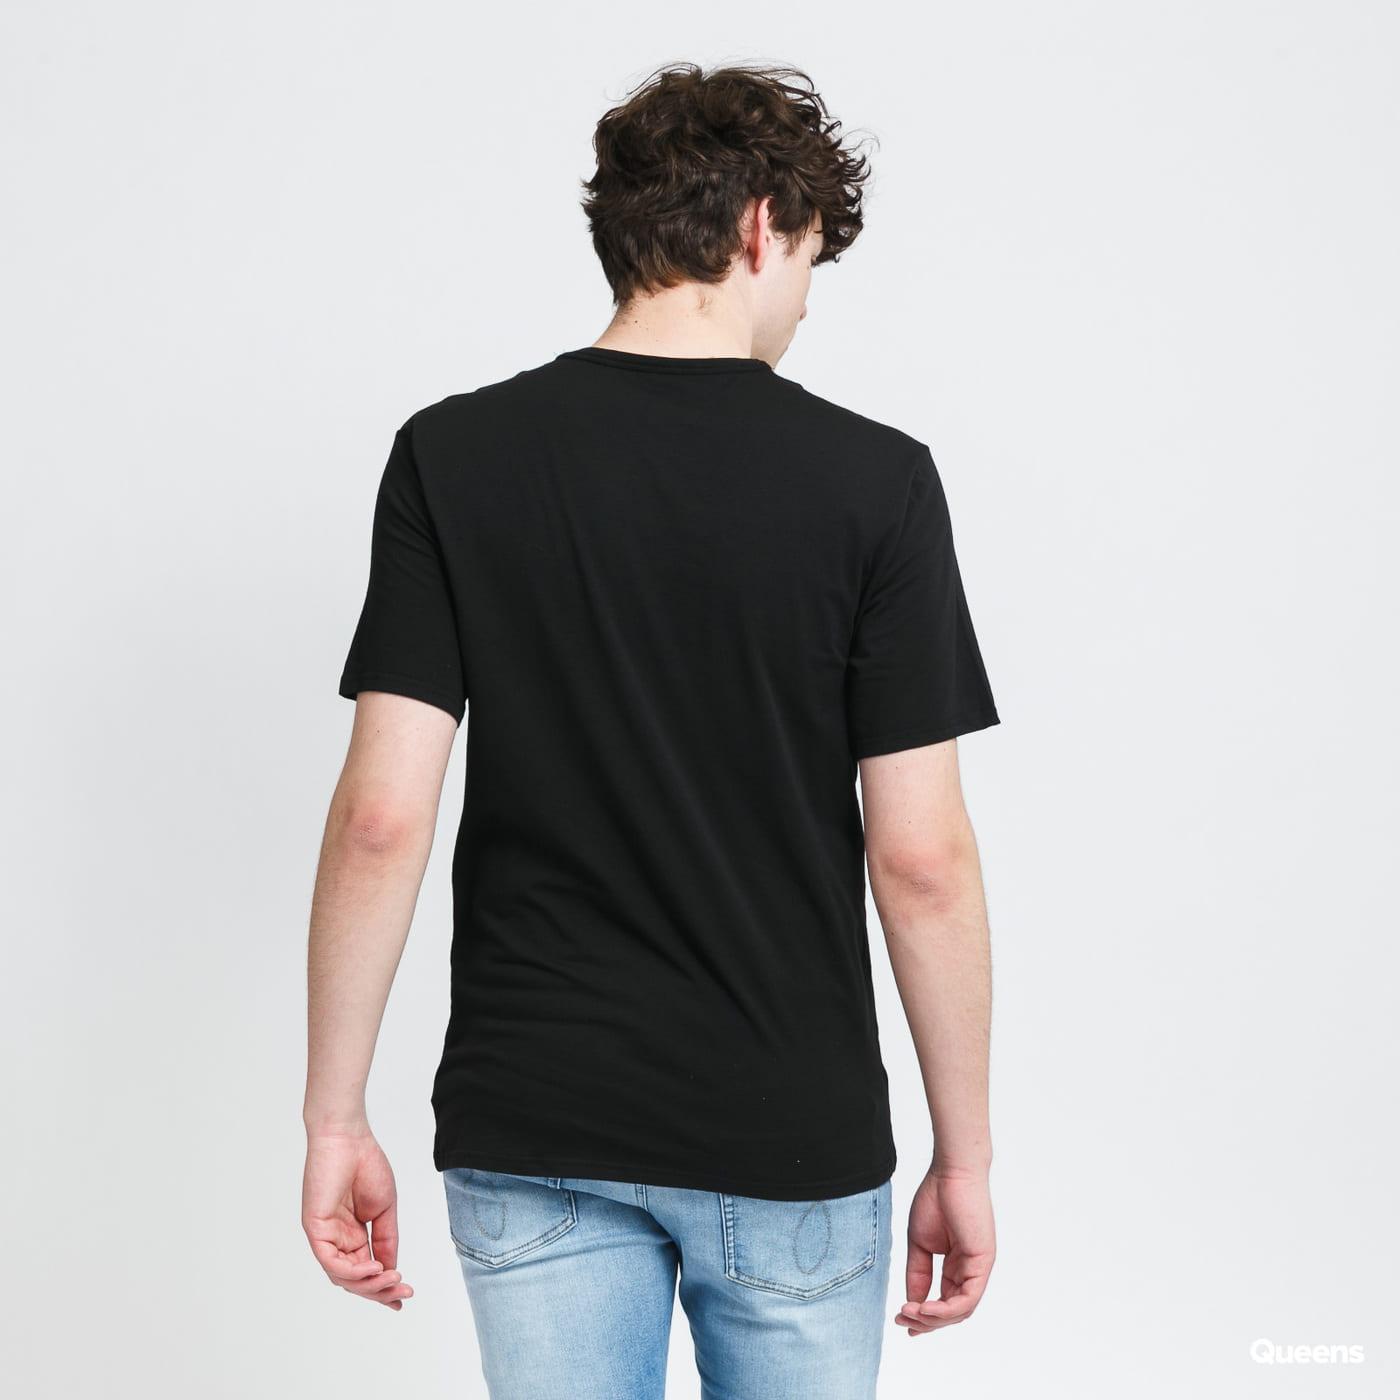 Calvin Klein CK ONE SS Crew Neck 2Pack C/O black / melange gray